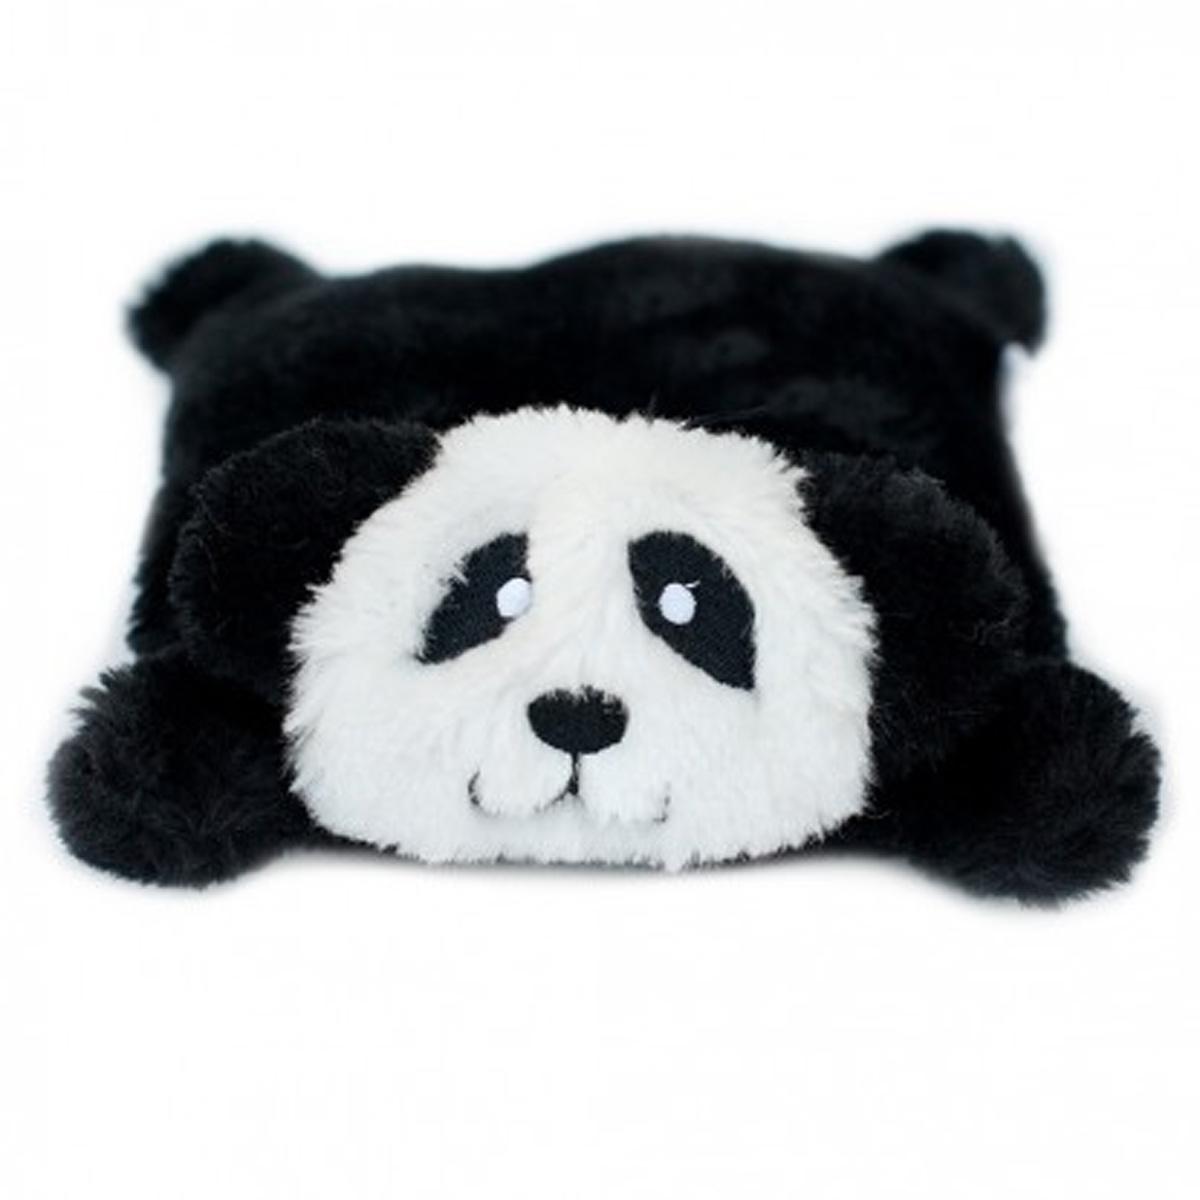 Squeakie Pad Dog Toy - Panda